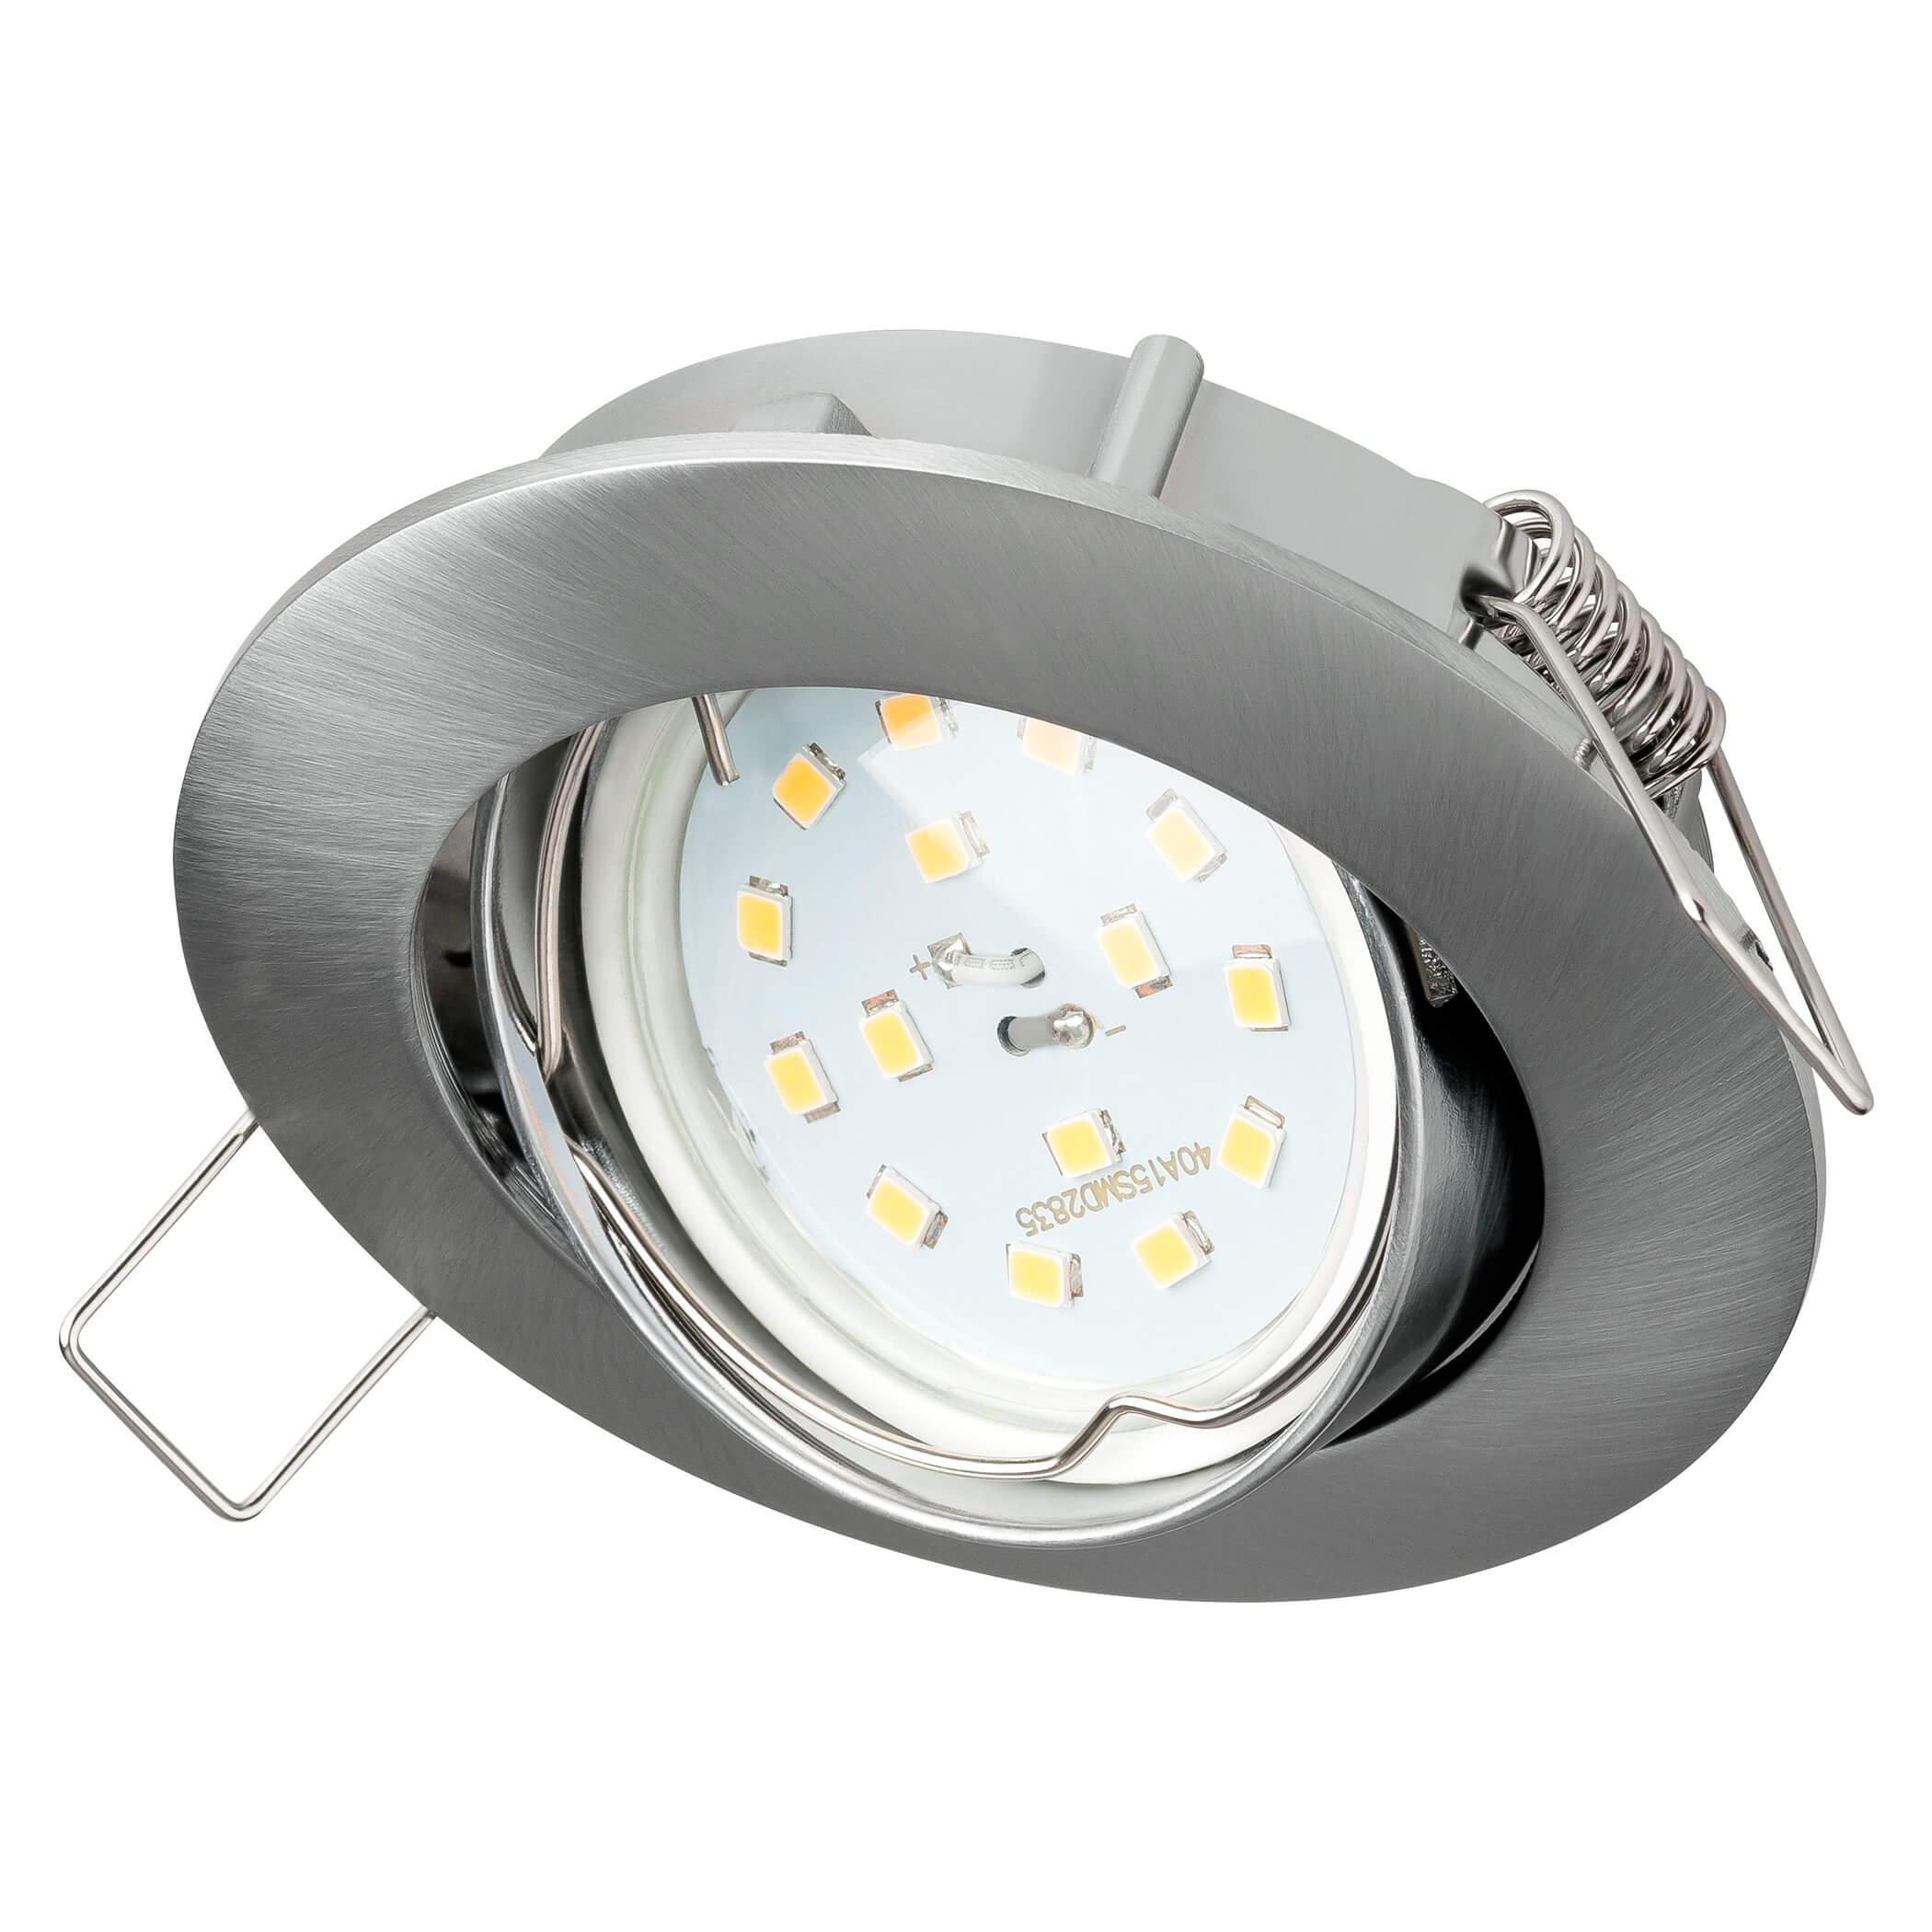 Einbaurahmen Typ 11 inkl. LED Modul